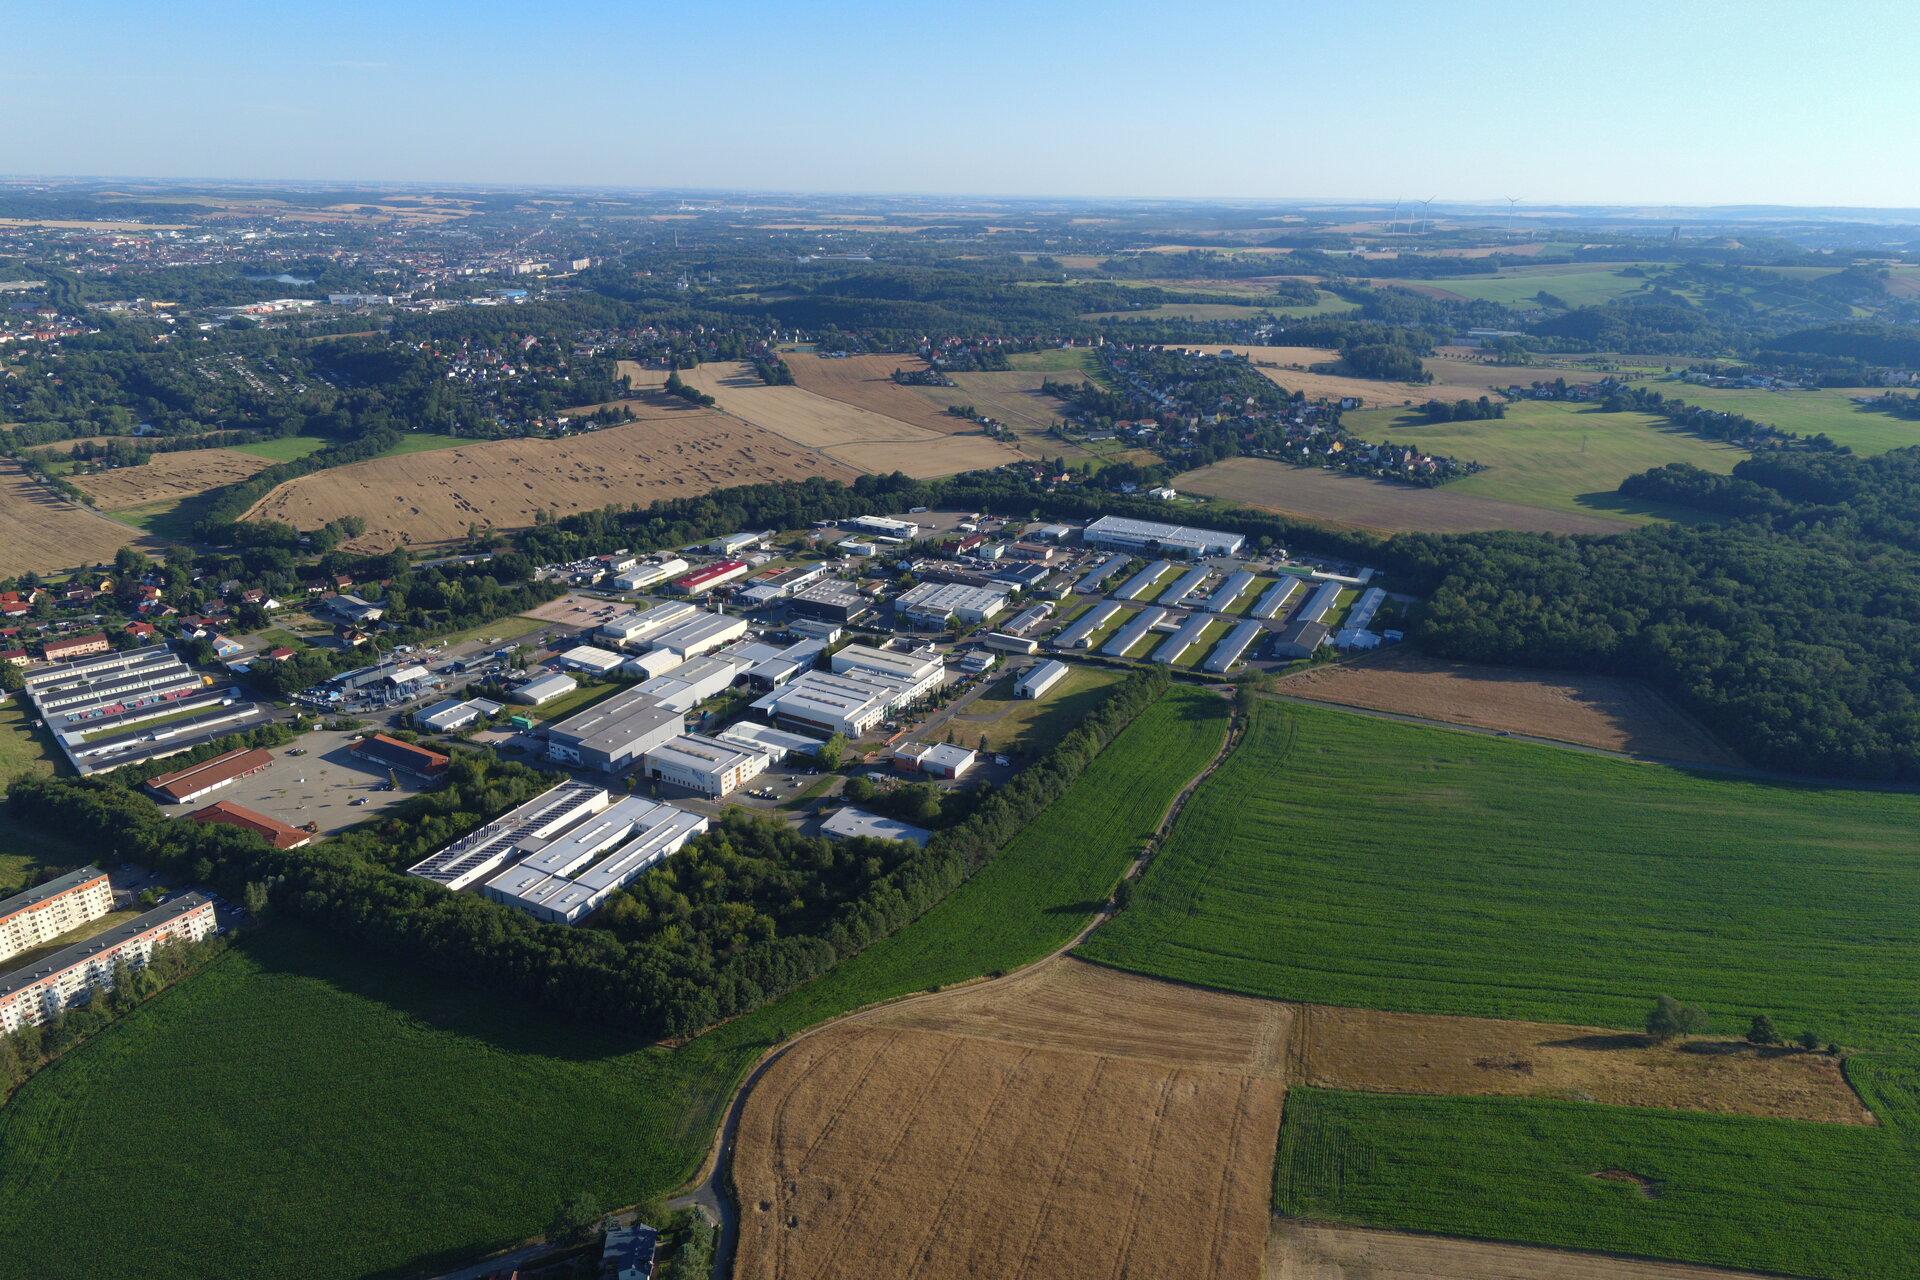 Blick aufs Gewerbegebiet (c) FFW Wilkau-Haßlau